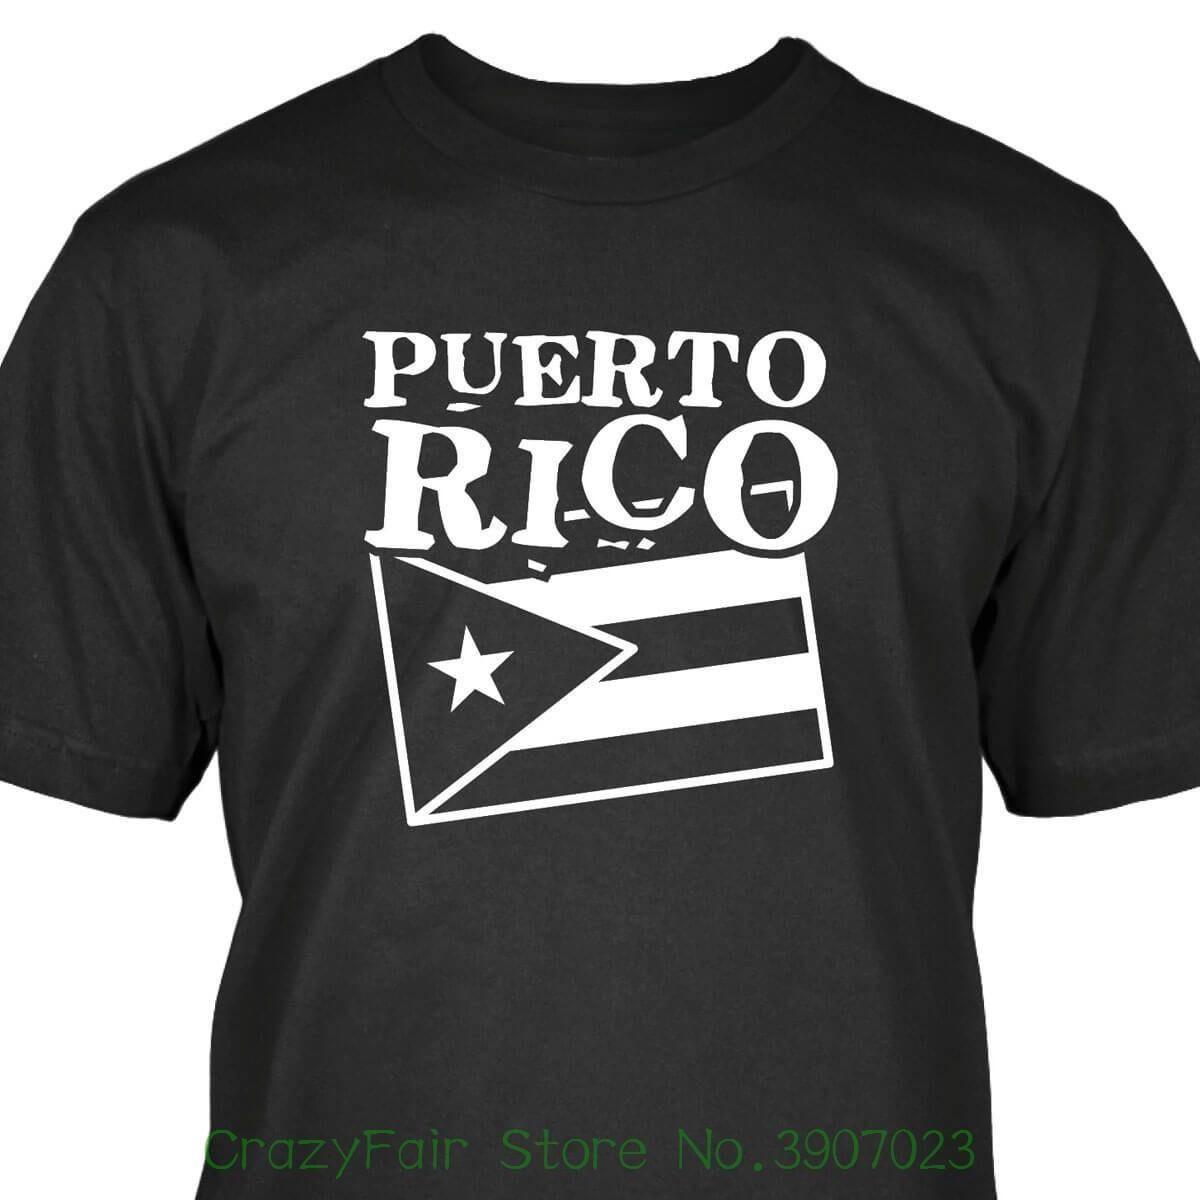 Puerto Rico T Shirt Mens High Quality Custom Printed Tops Hipster